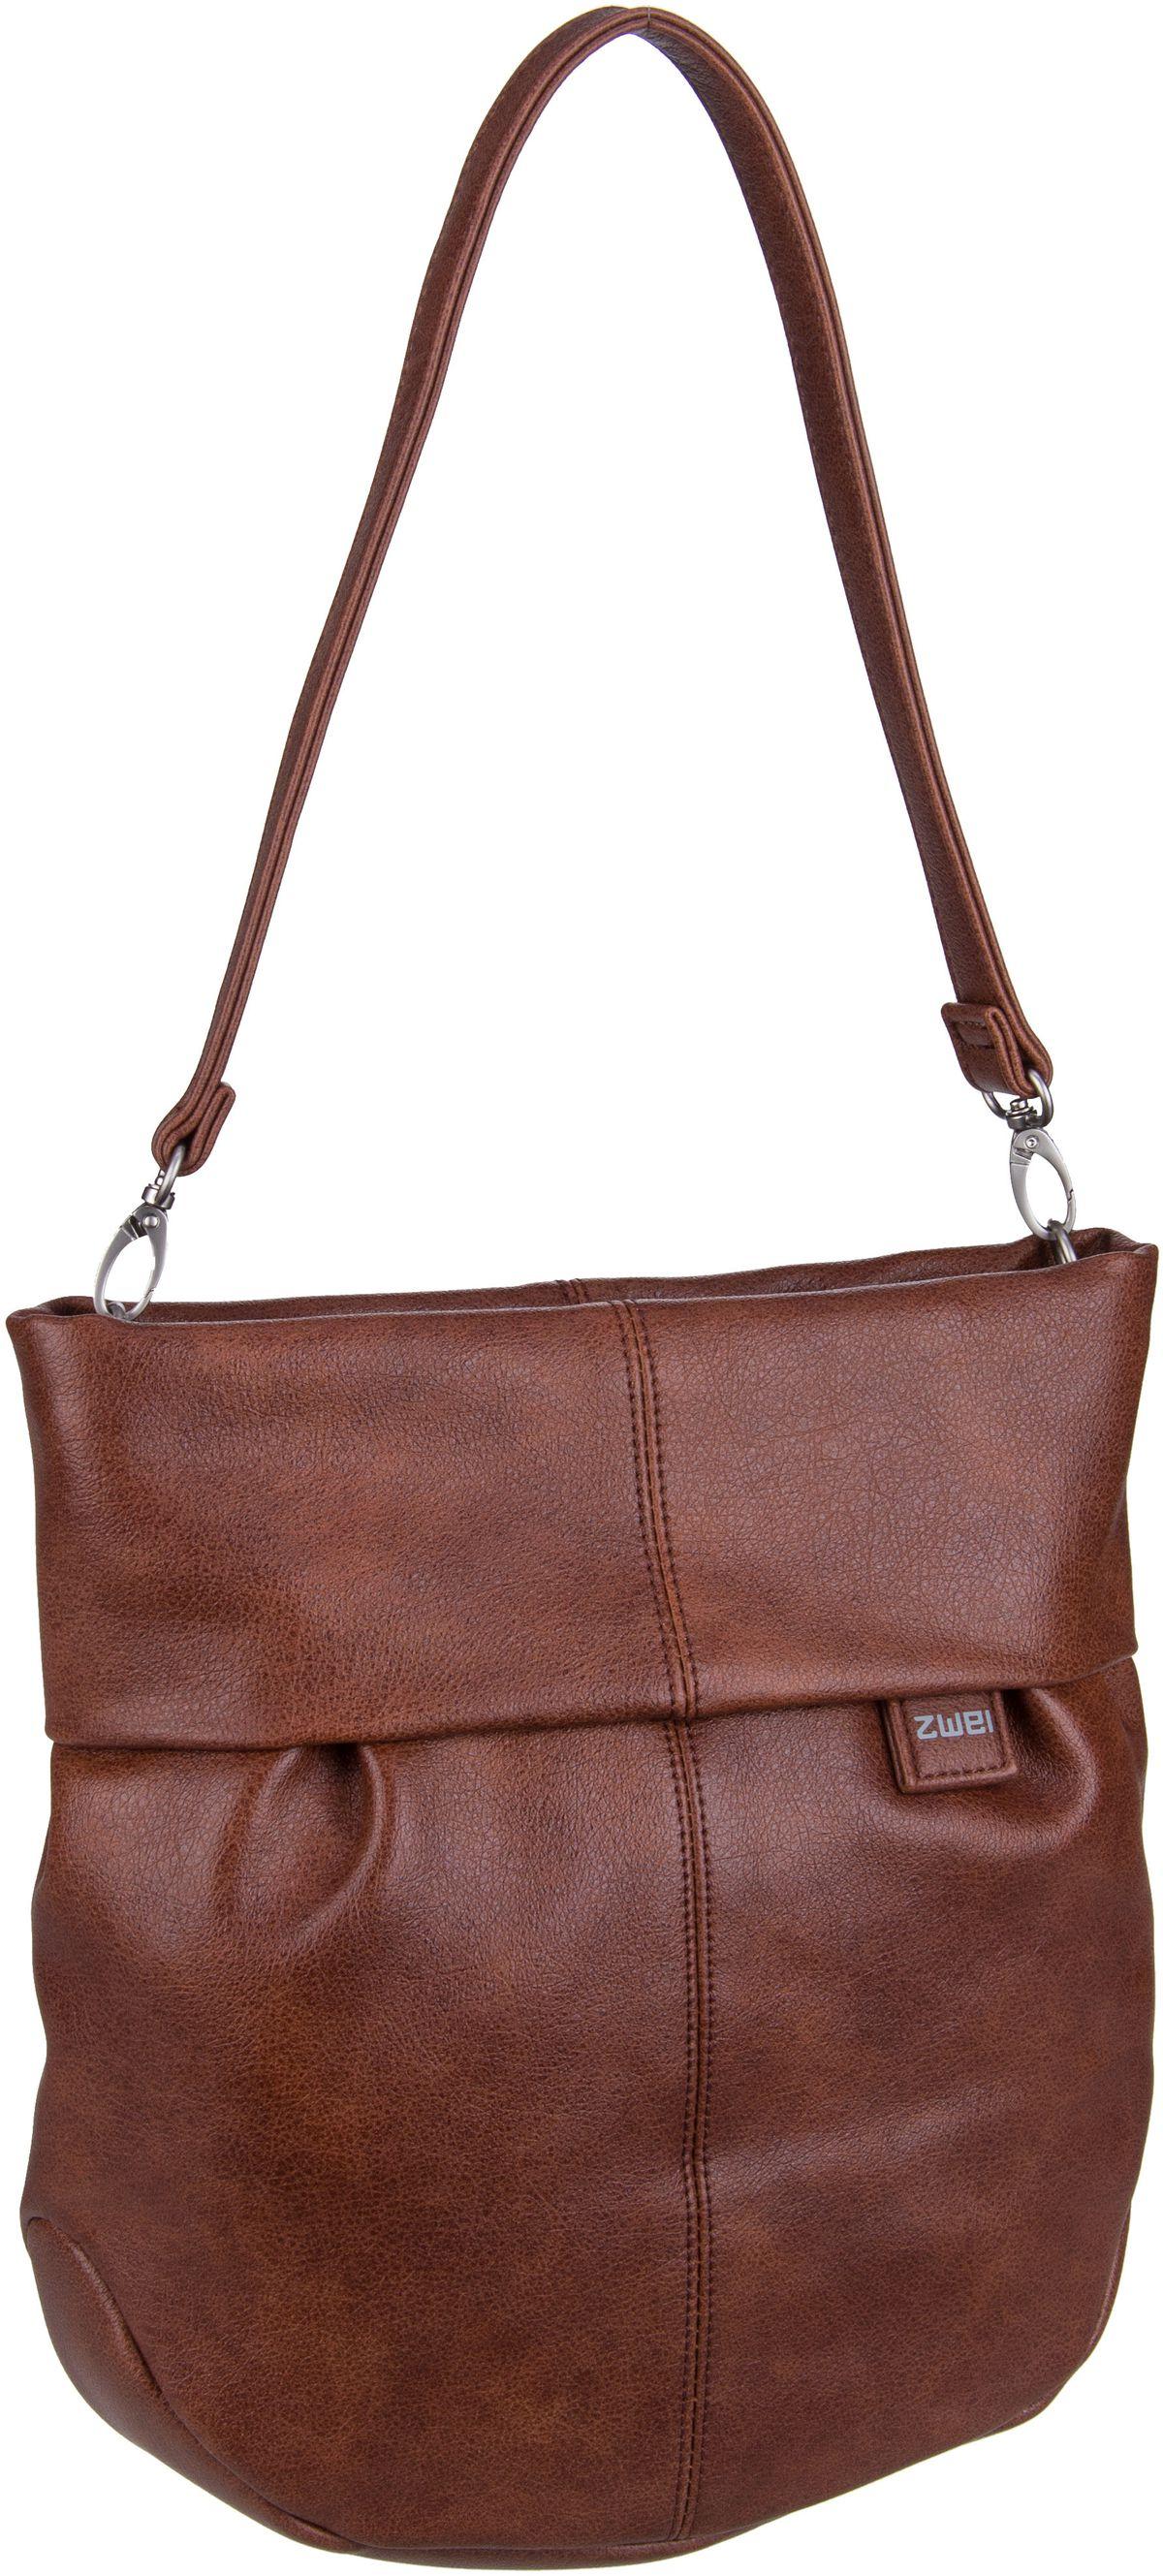 Handtasche Mademoiselle M100 Cognac (5 Liter)